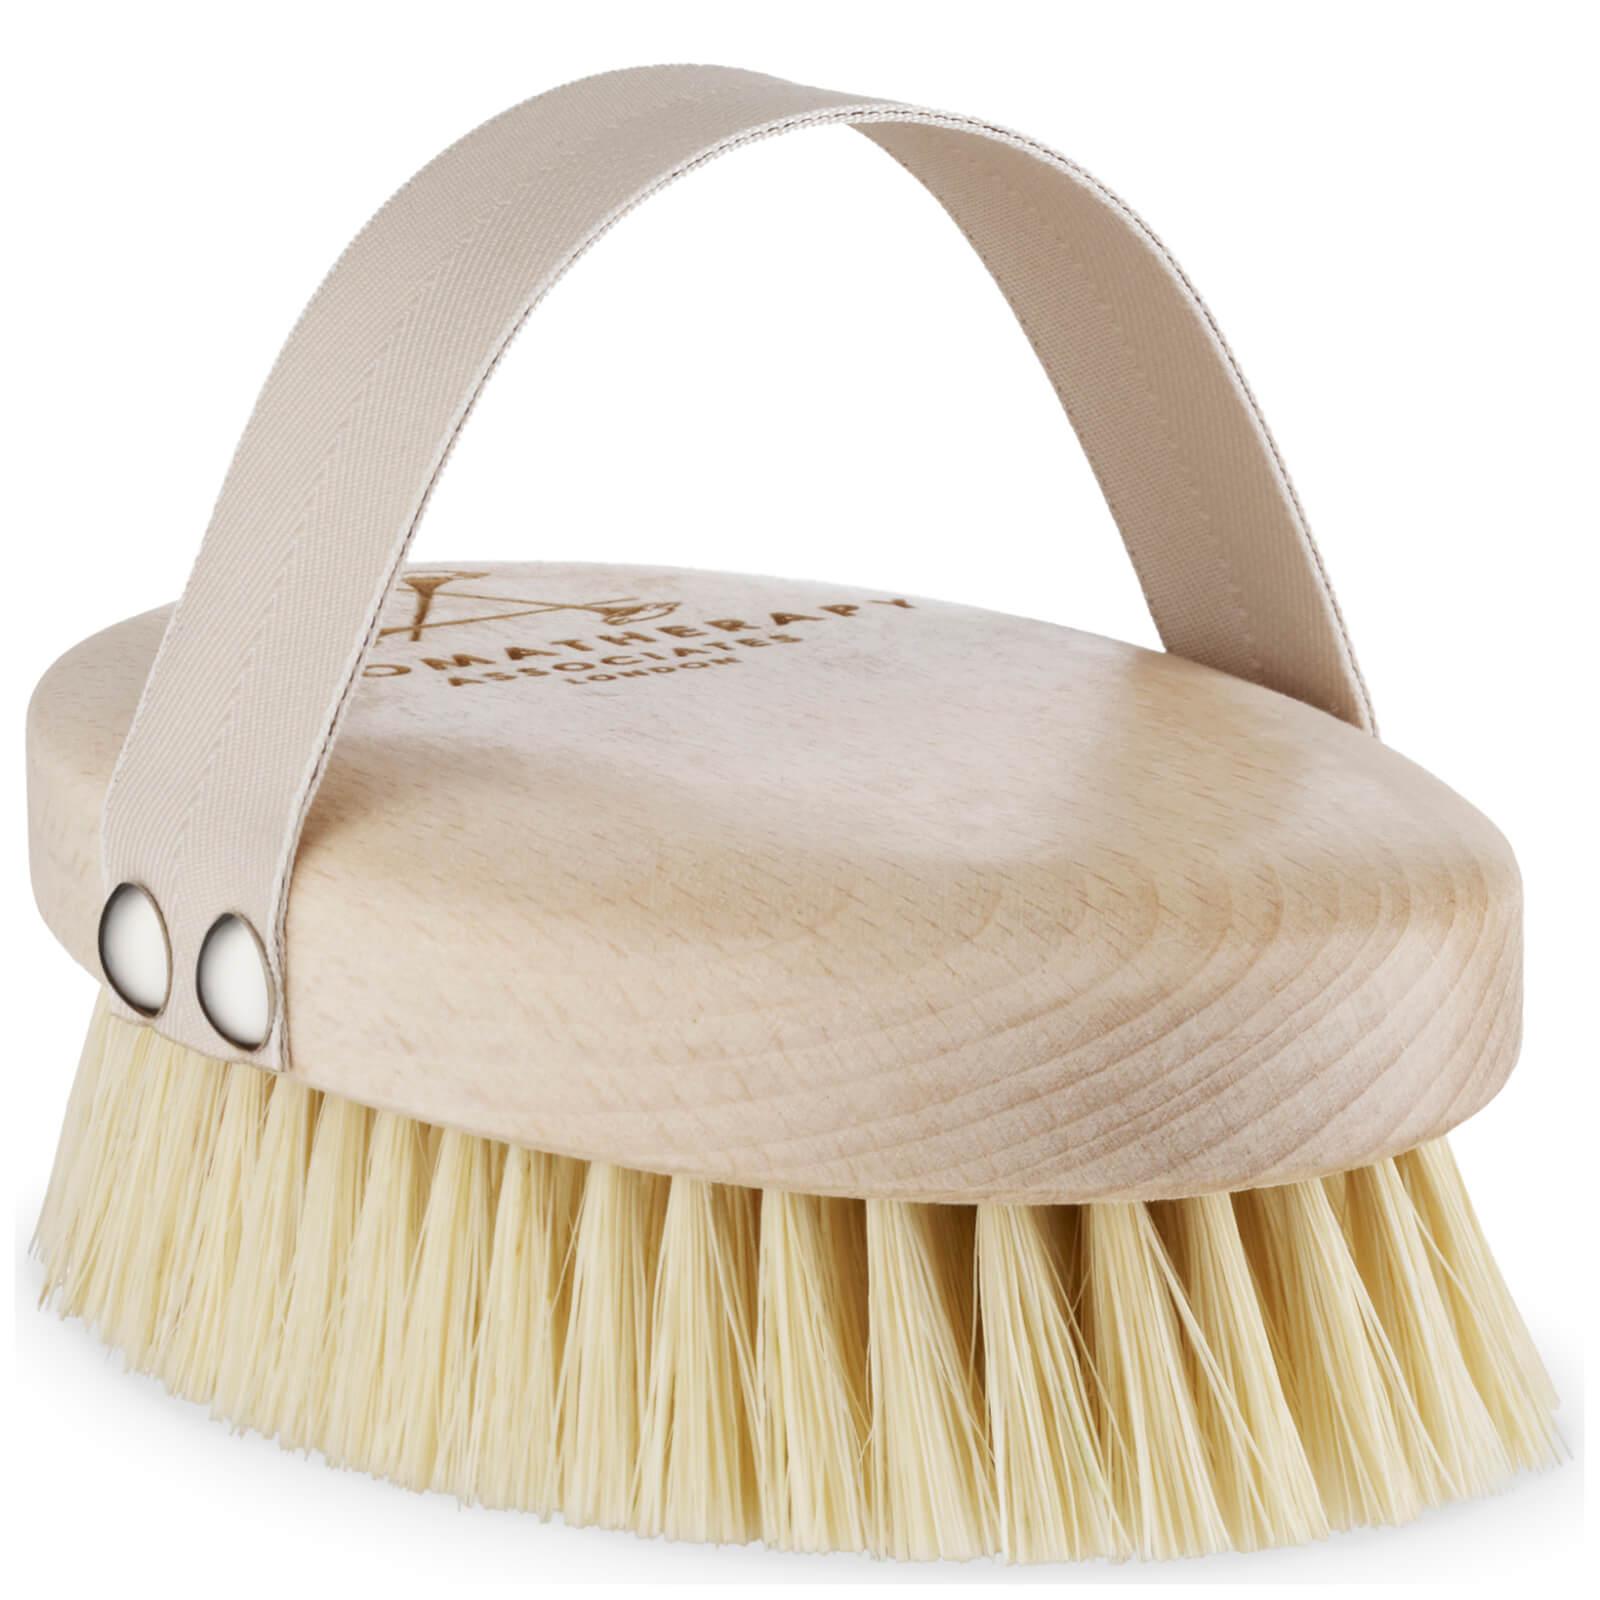 Aromatherapy Associates Polishing Body Brush